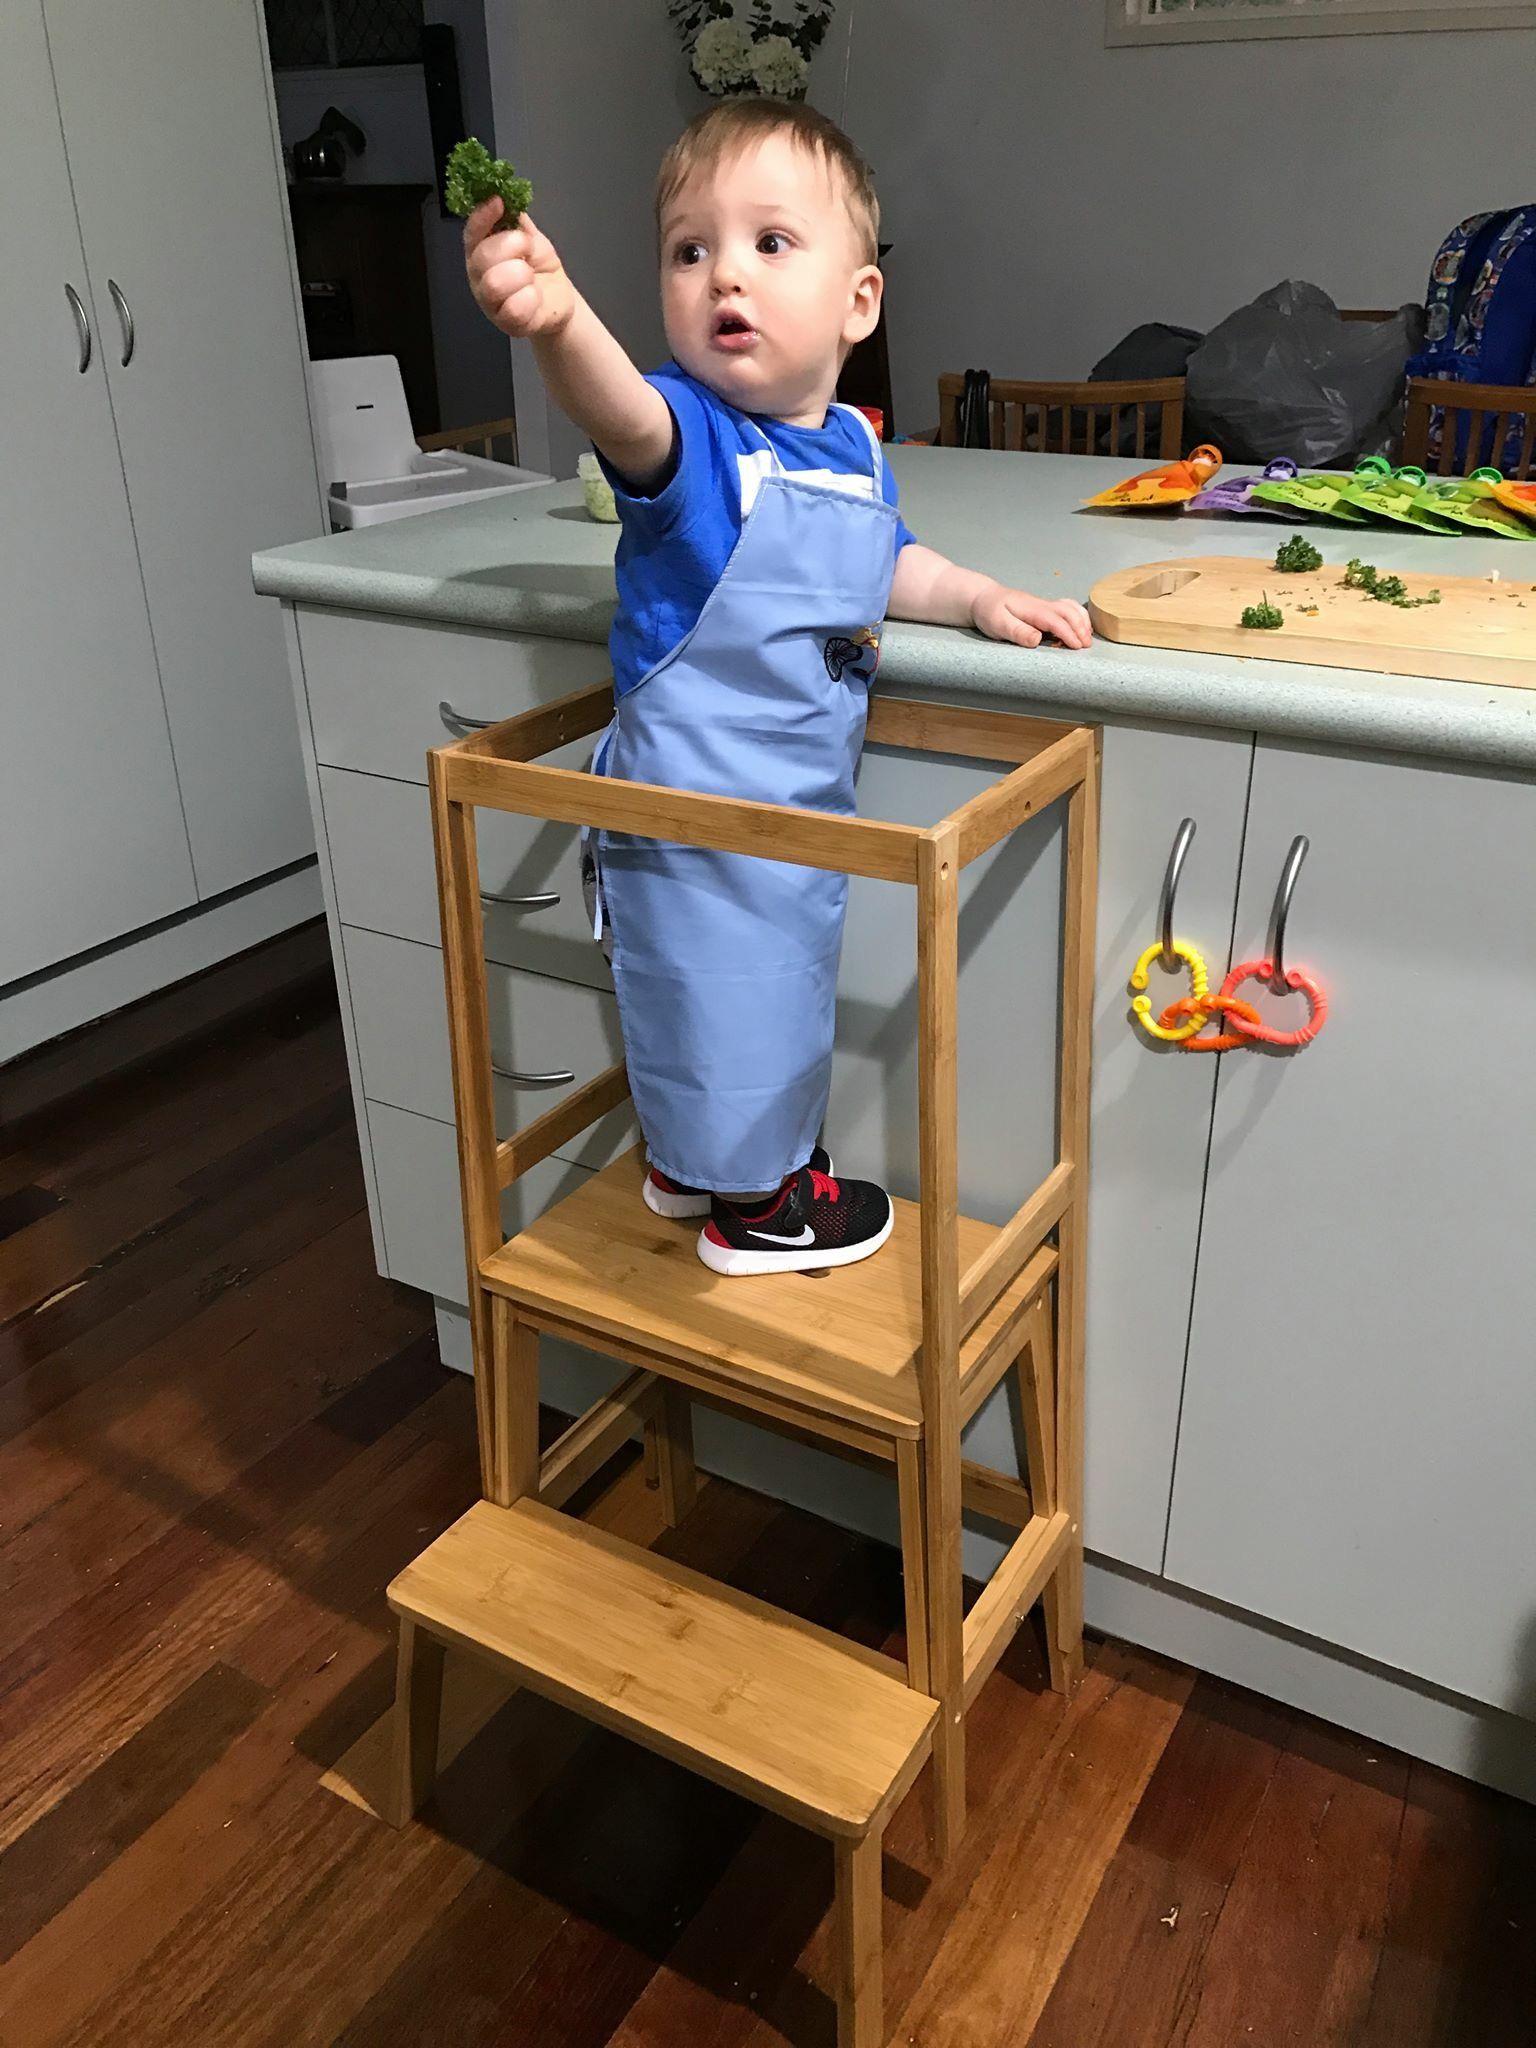 Step Stool And Modified Towel Rack Step Stool Kids Step Stool